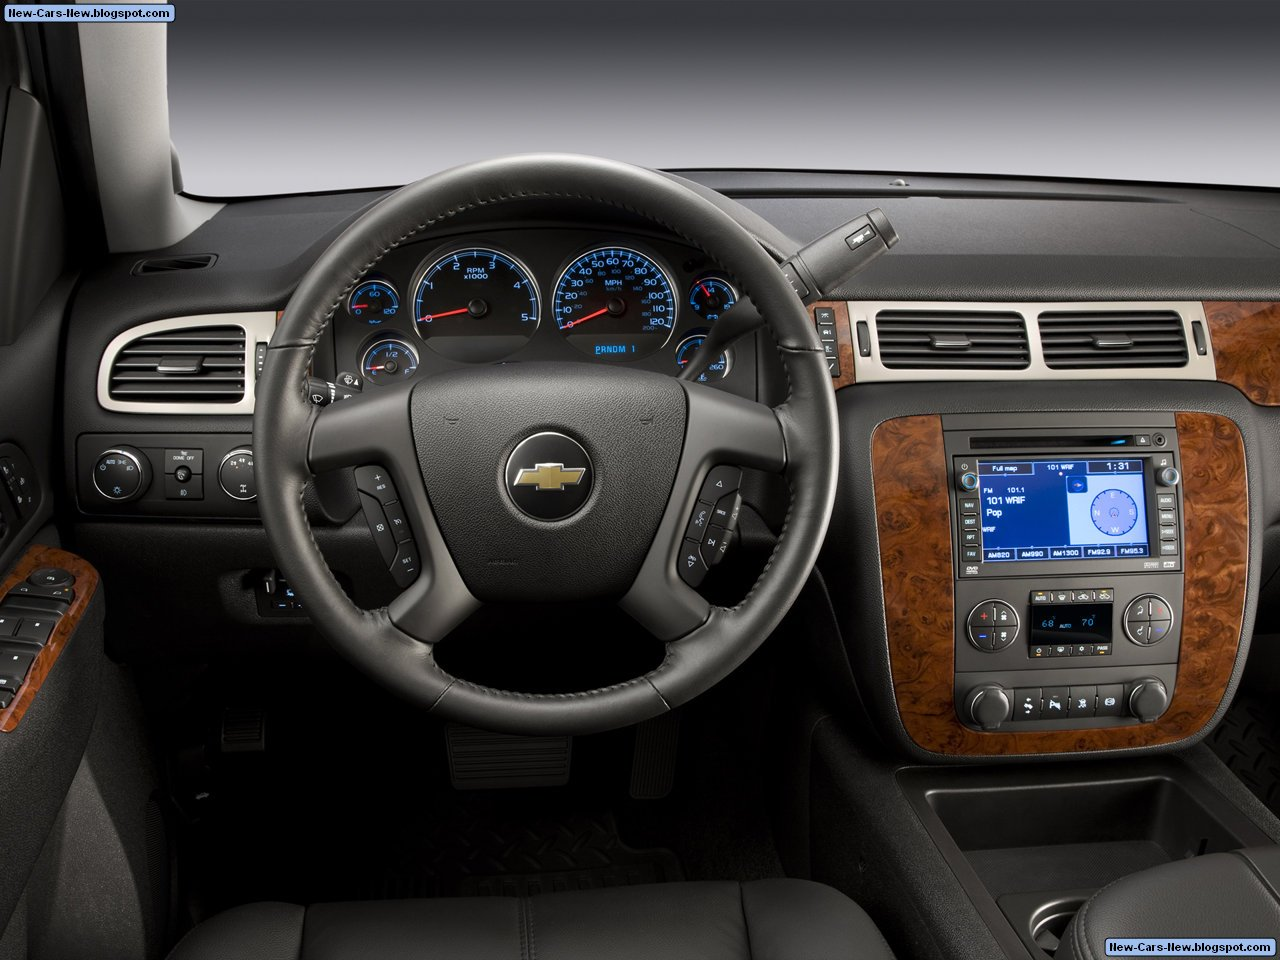 http://4.bp.blogspot.com/_U4w592tUDHM/TCBs9RjMG4I/AAAAAAAACRY/wcKAeseGtbo/s1600/Chevrolet-Silverado_HD_2011_1280x960_wallpaper_04.jpg